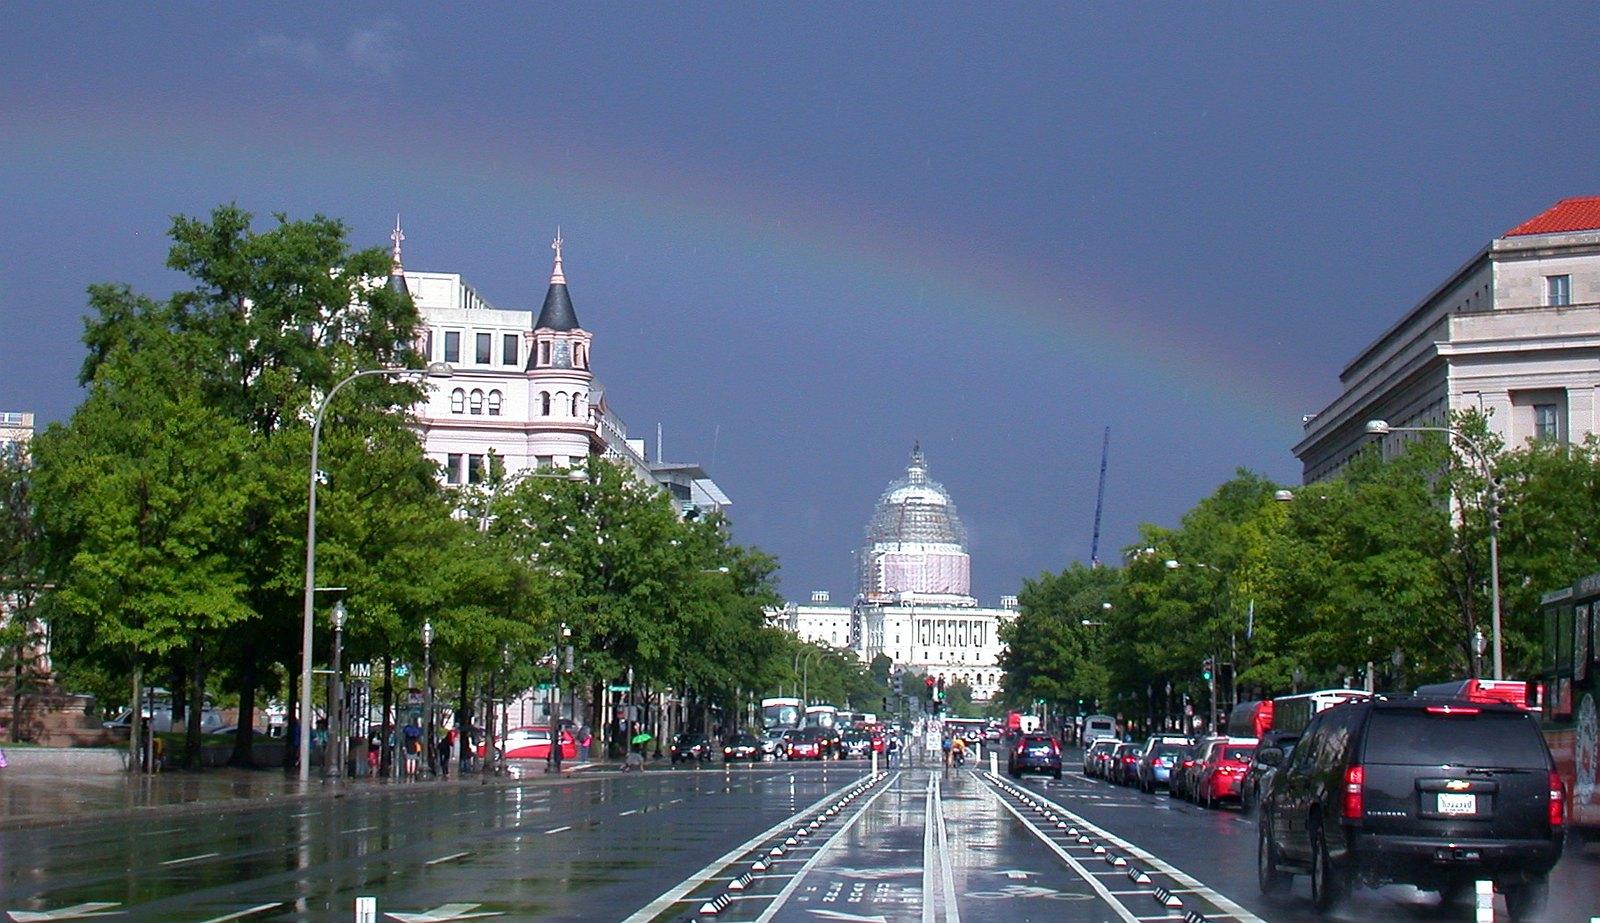 Rainbow (cropped)